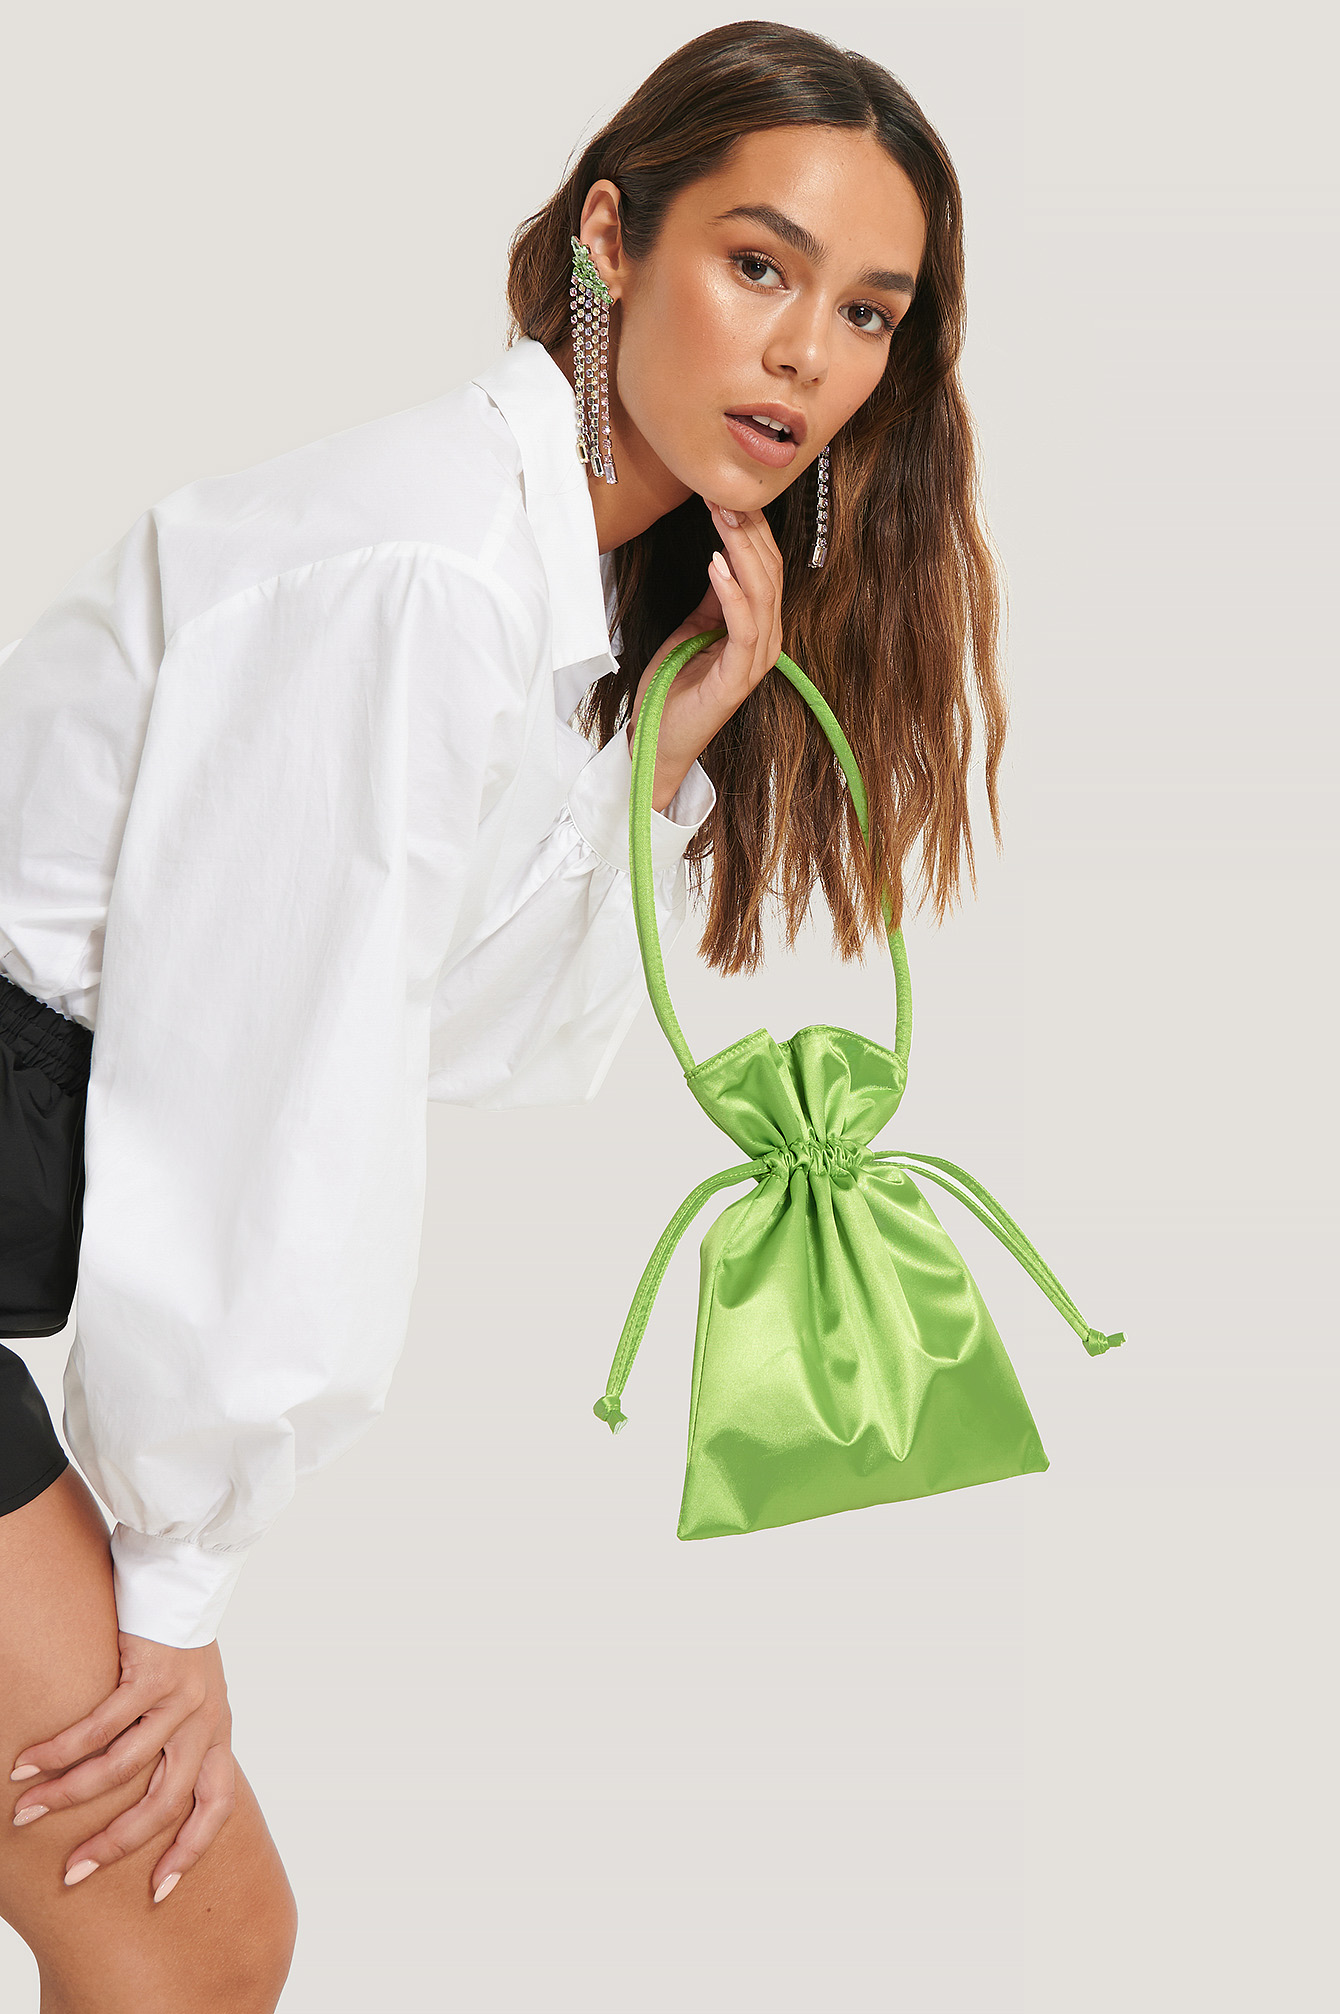 Lizzy x NA-KD Satin Pouch Bag - Green